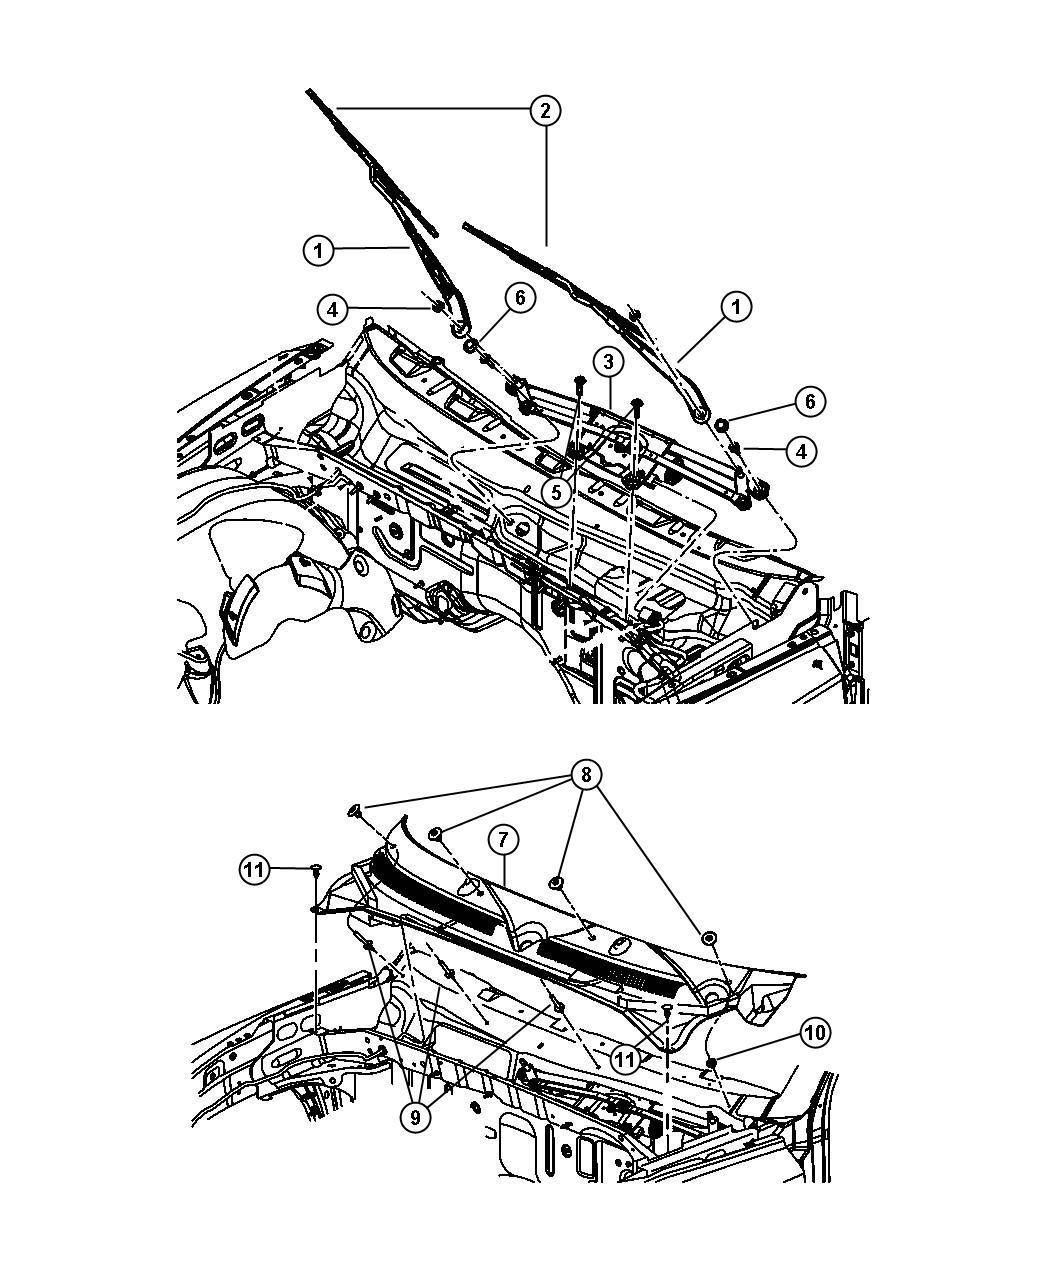 2008 Dodge Dakota Motor and linkage. Windshield wiper